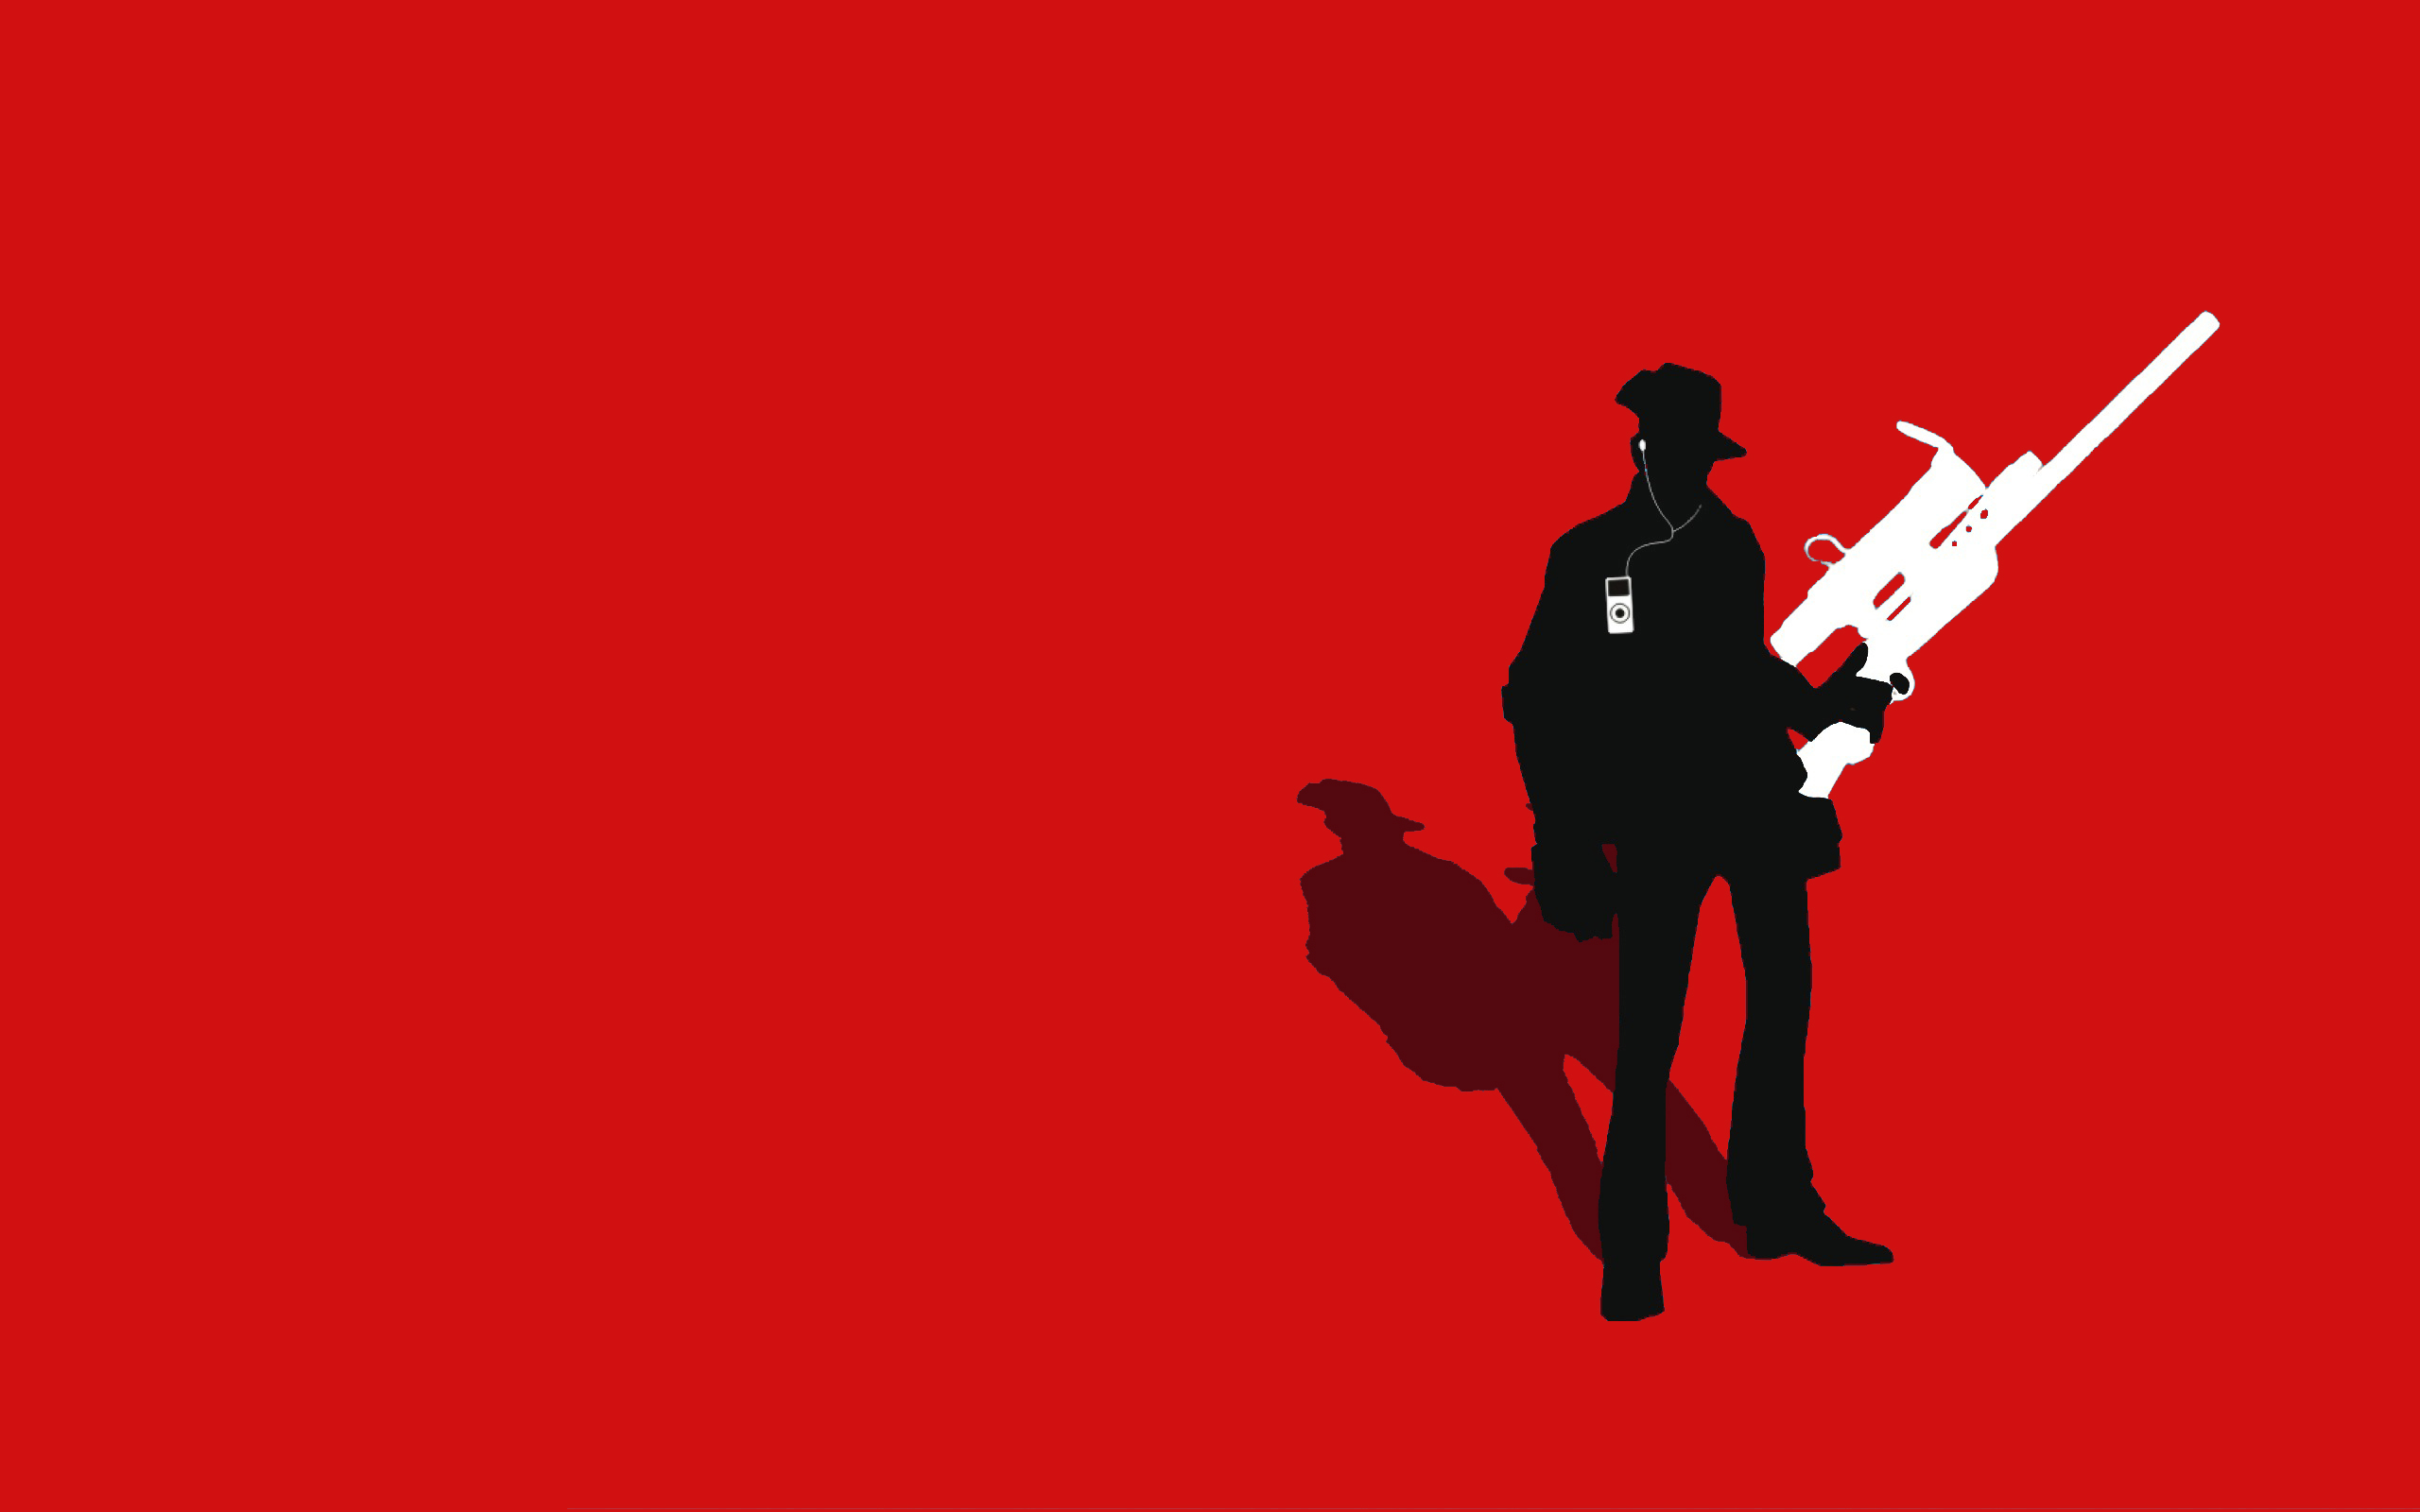 [Obrazek: tf2_red_sniper_silhouette_ipod_earbuds_2...6i310t.jpg]